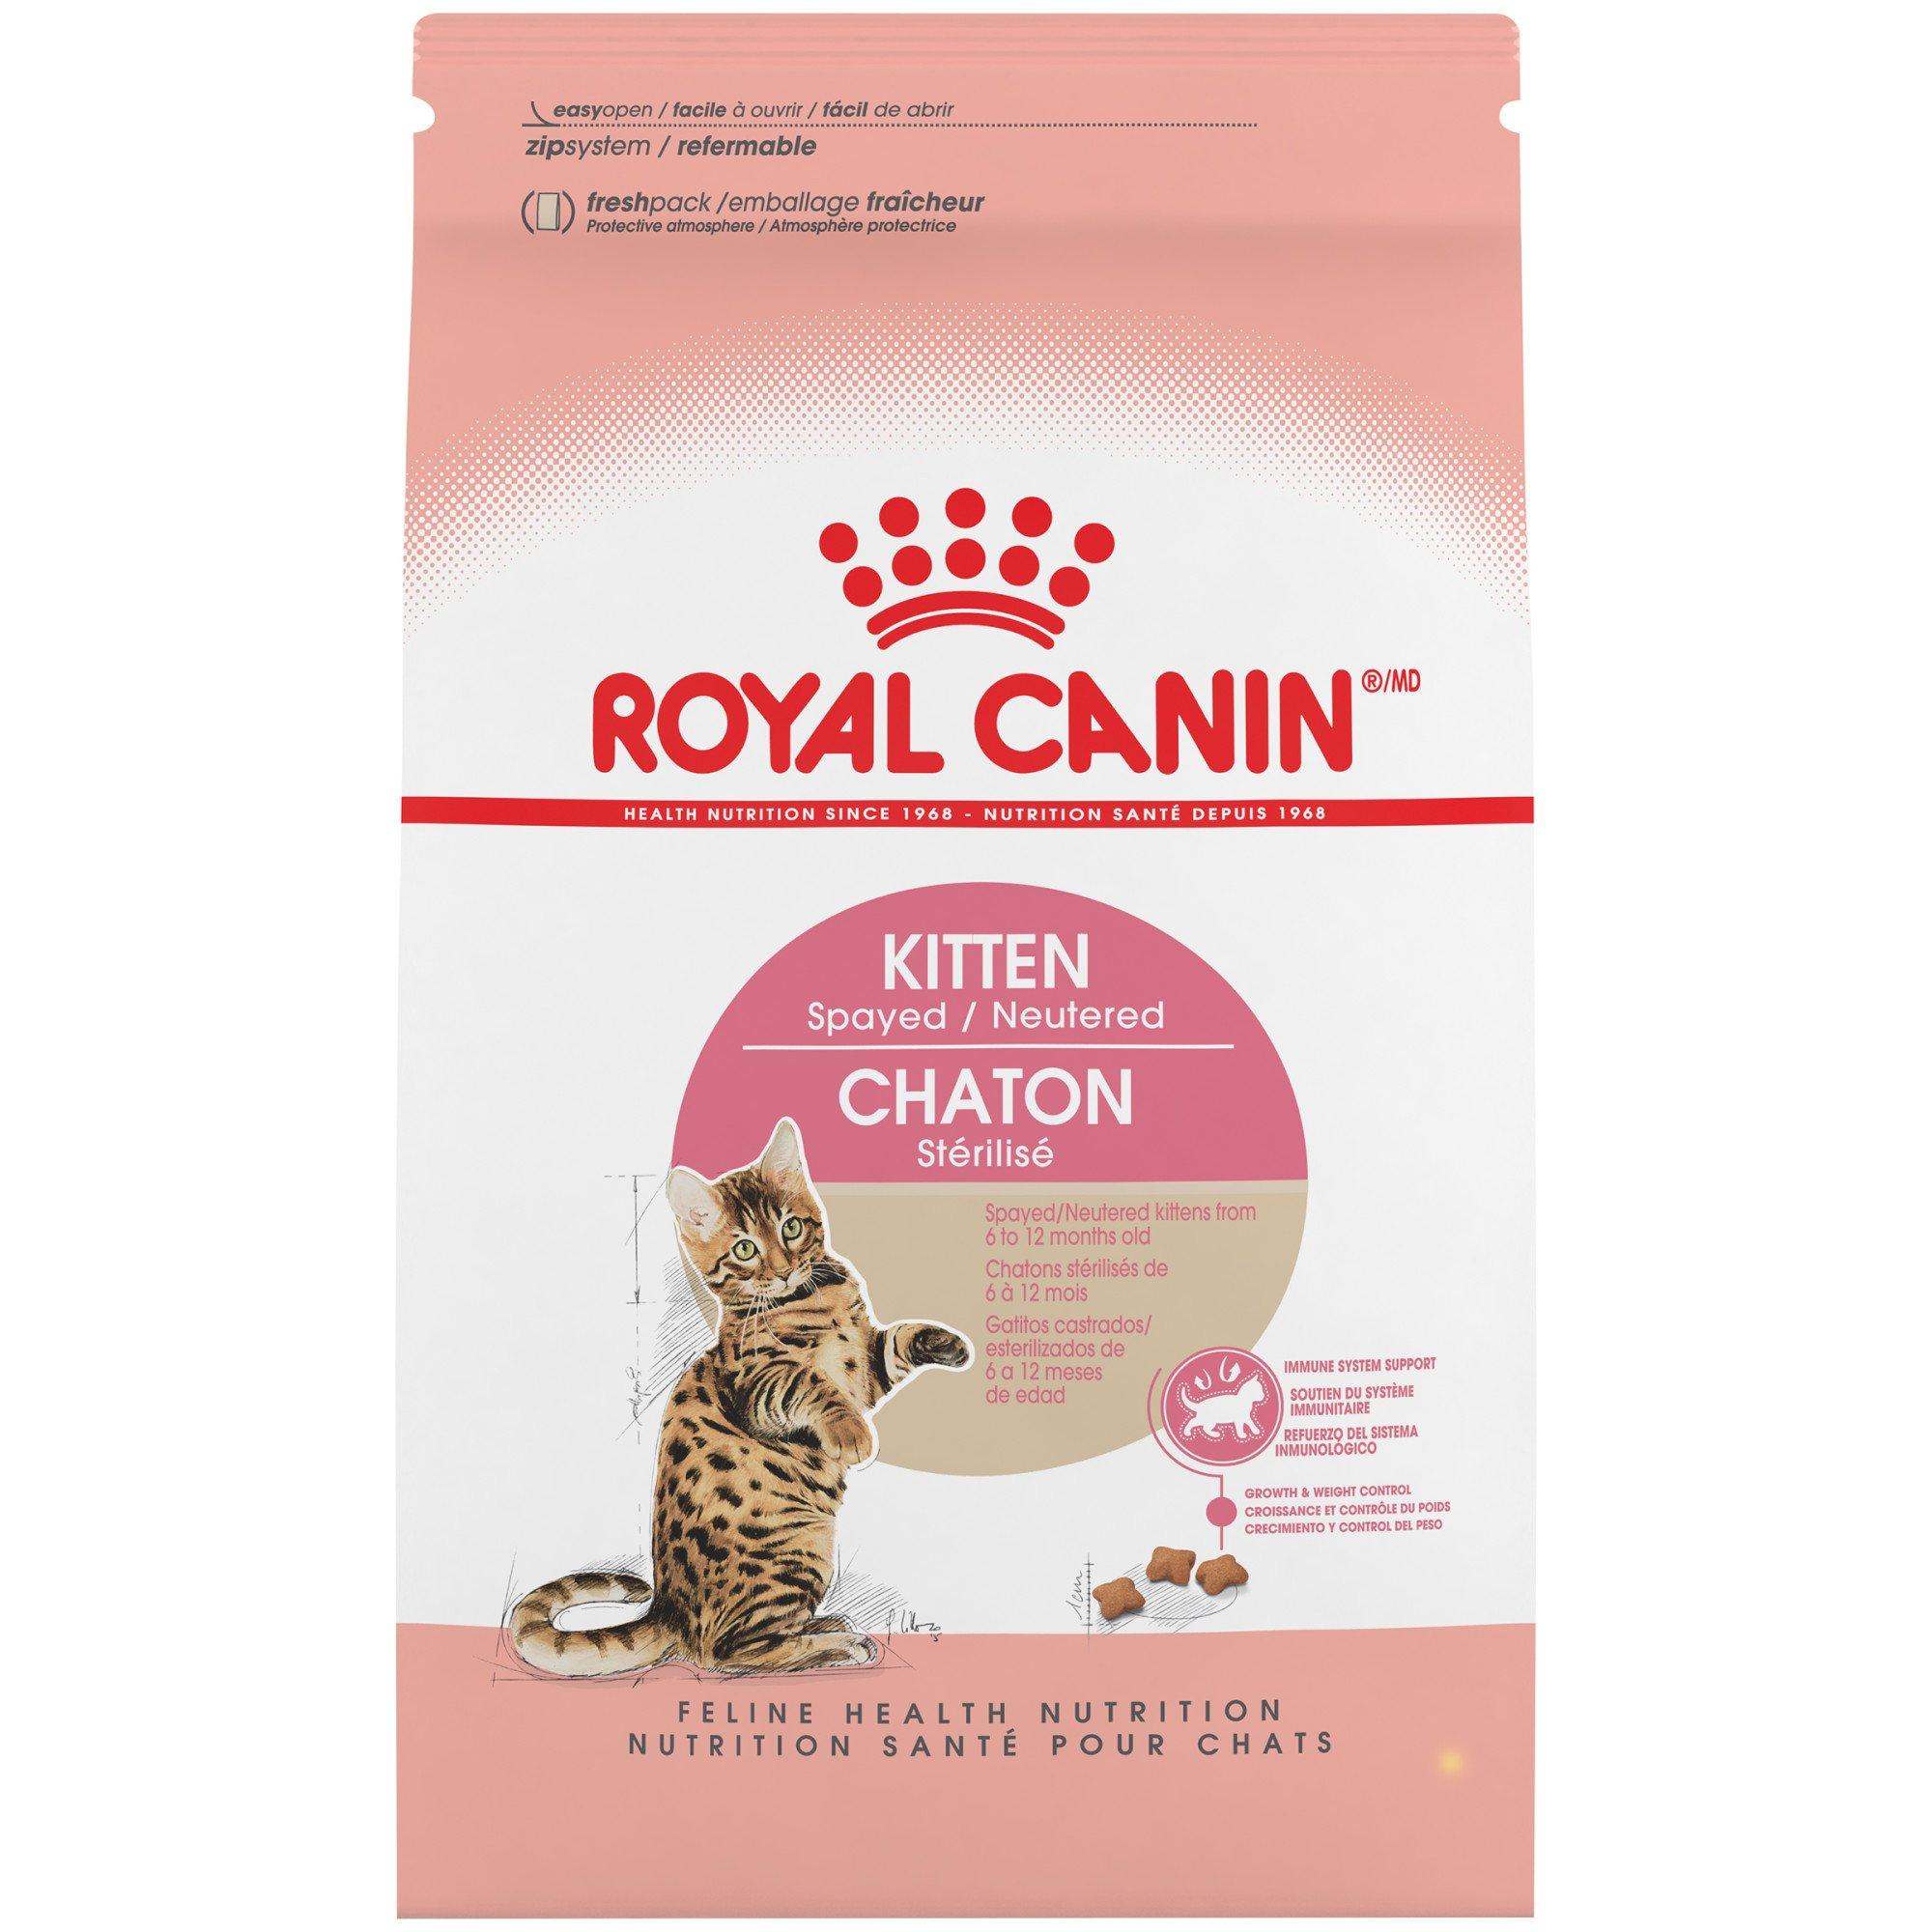 Royal Canin FELINE HEALTH NUTRITION Kitten Spayed/Neutered dry cat food, 2.5-Pound